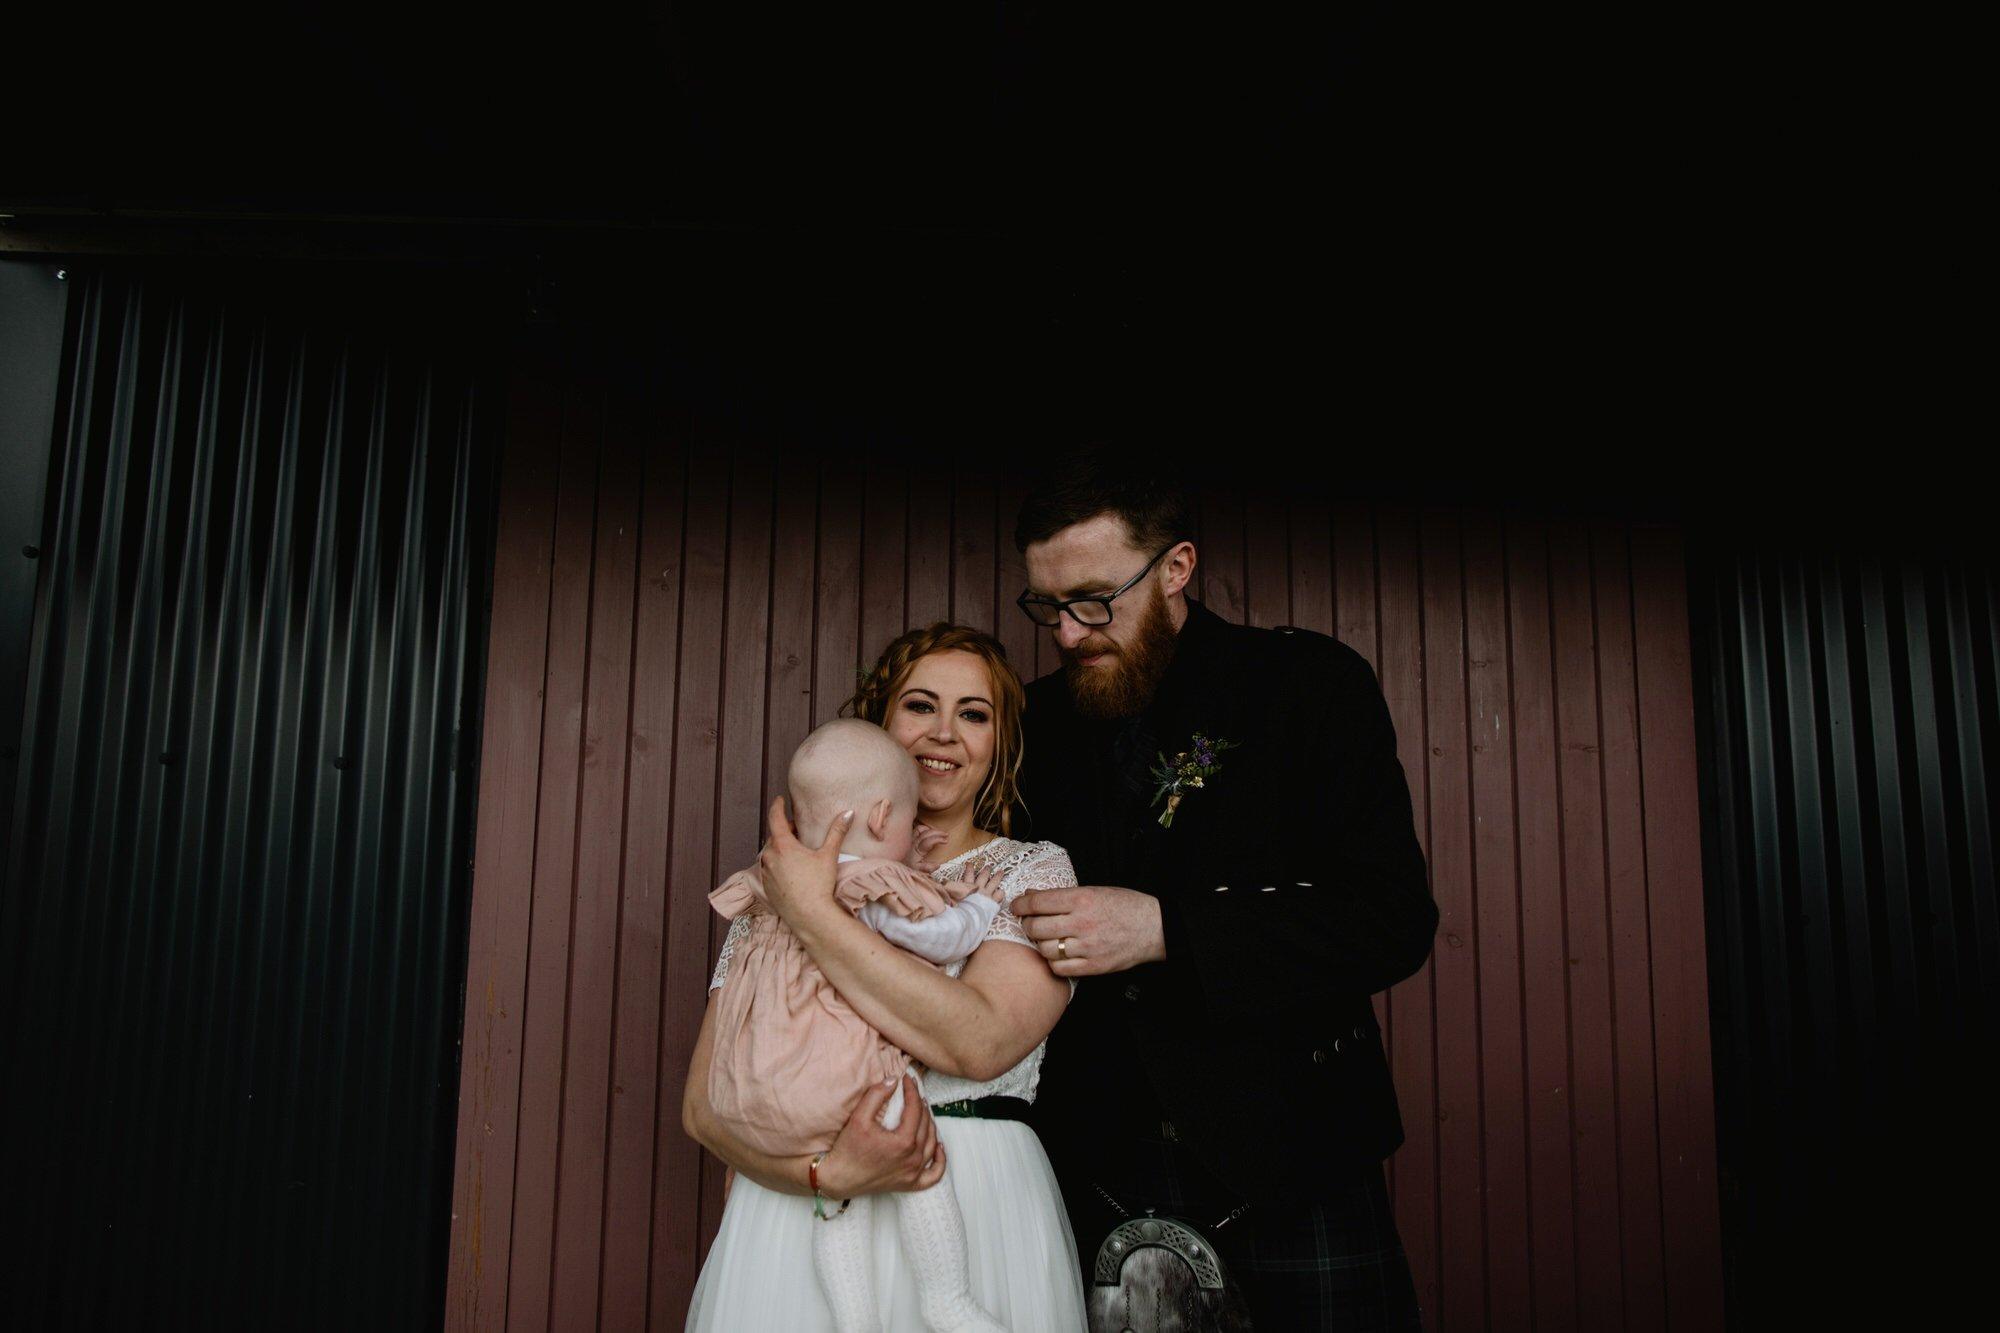 040 TIN SHED KNOCKRAICH WEDDING AUSTRIAN SCOTTISH ZOE ALEXANDRA PHOTOGRAPHY